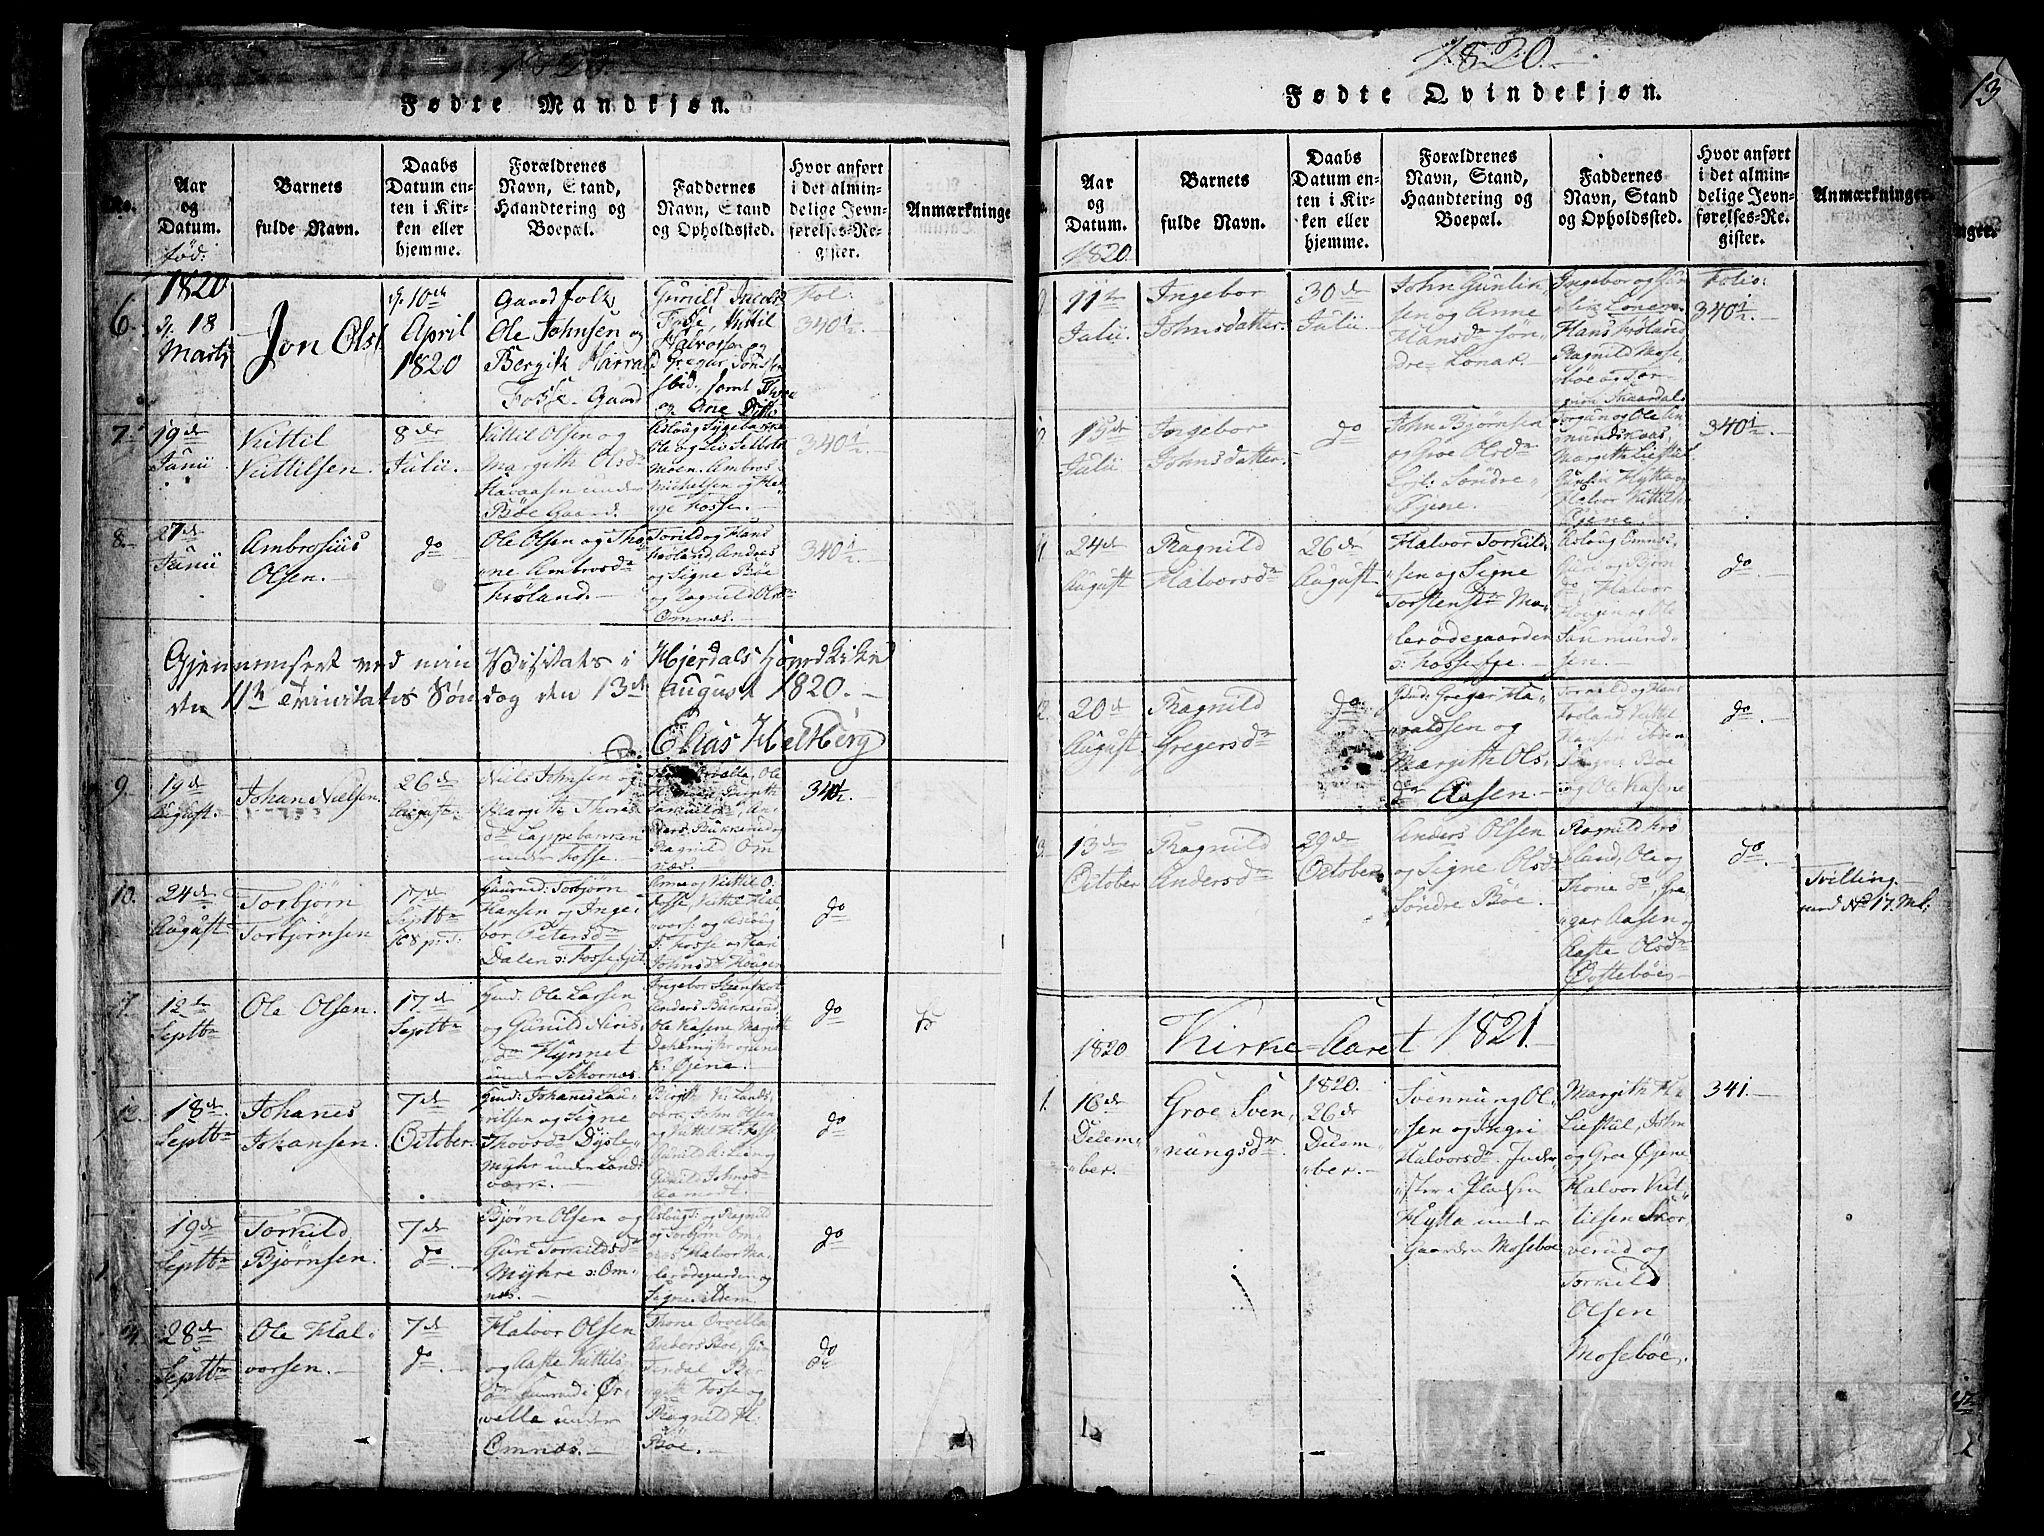 SAKO, Hjartdal kirkebøker, F/Fb/L0001: Ministerialbok nr. II 1, 1815-1843, s. 11